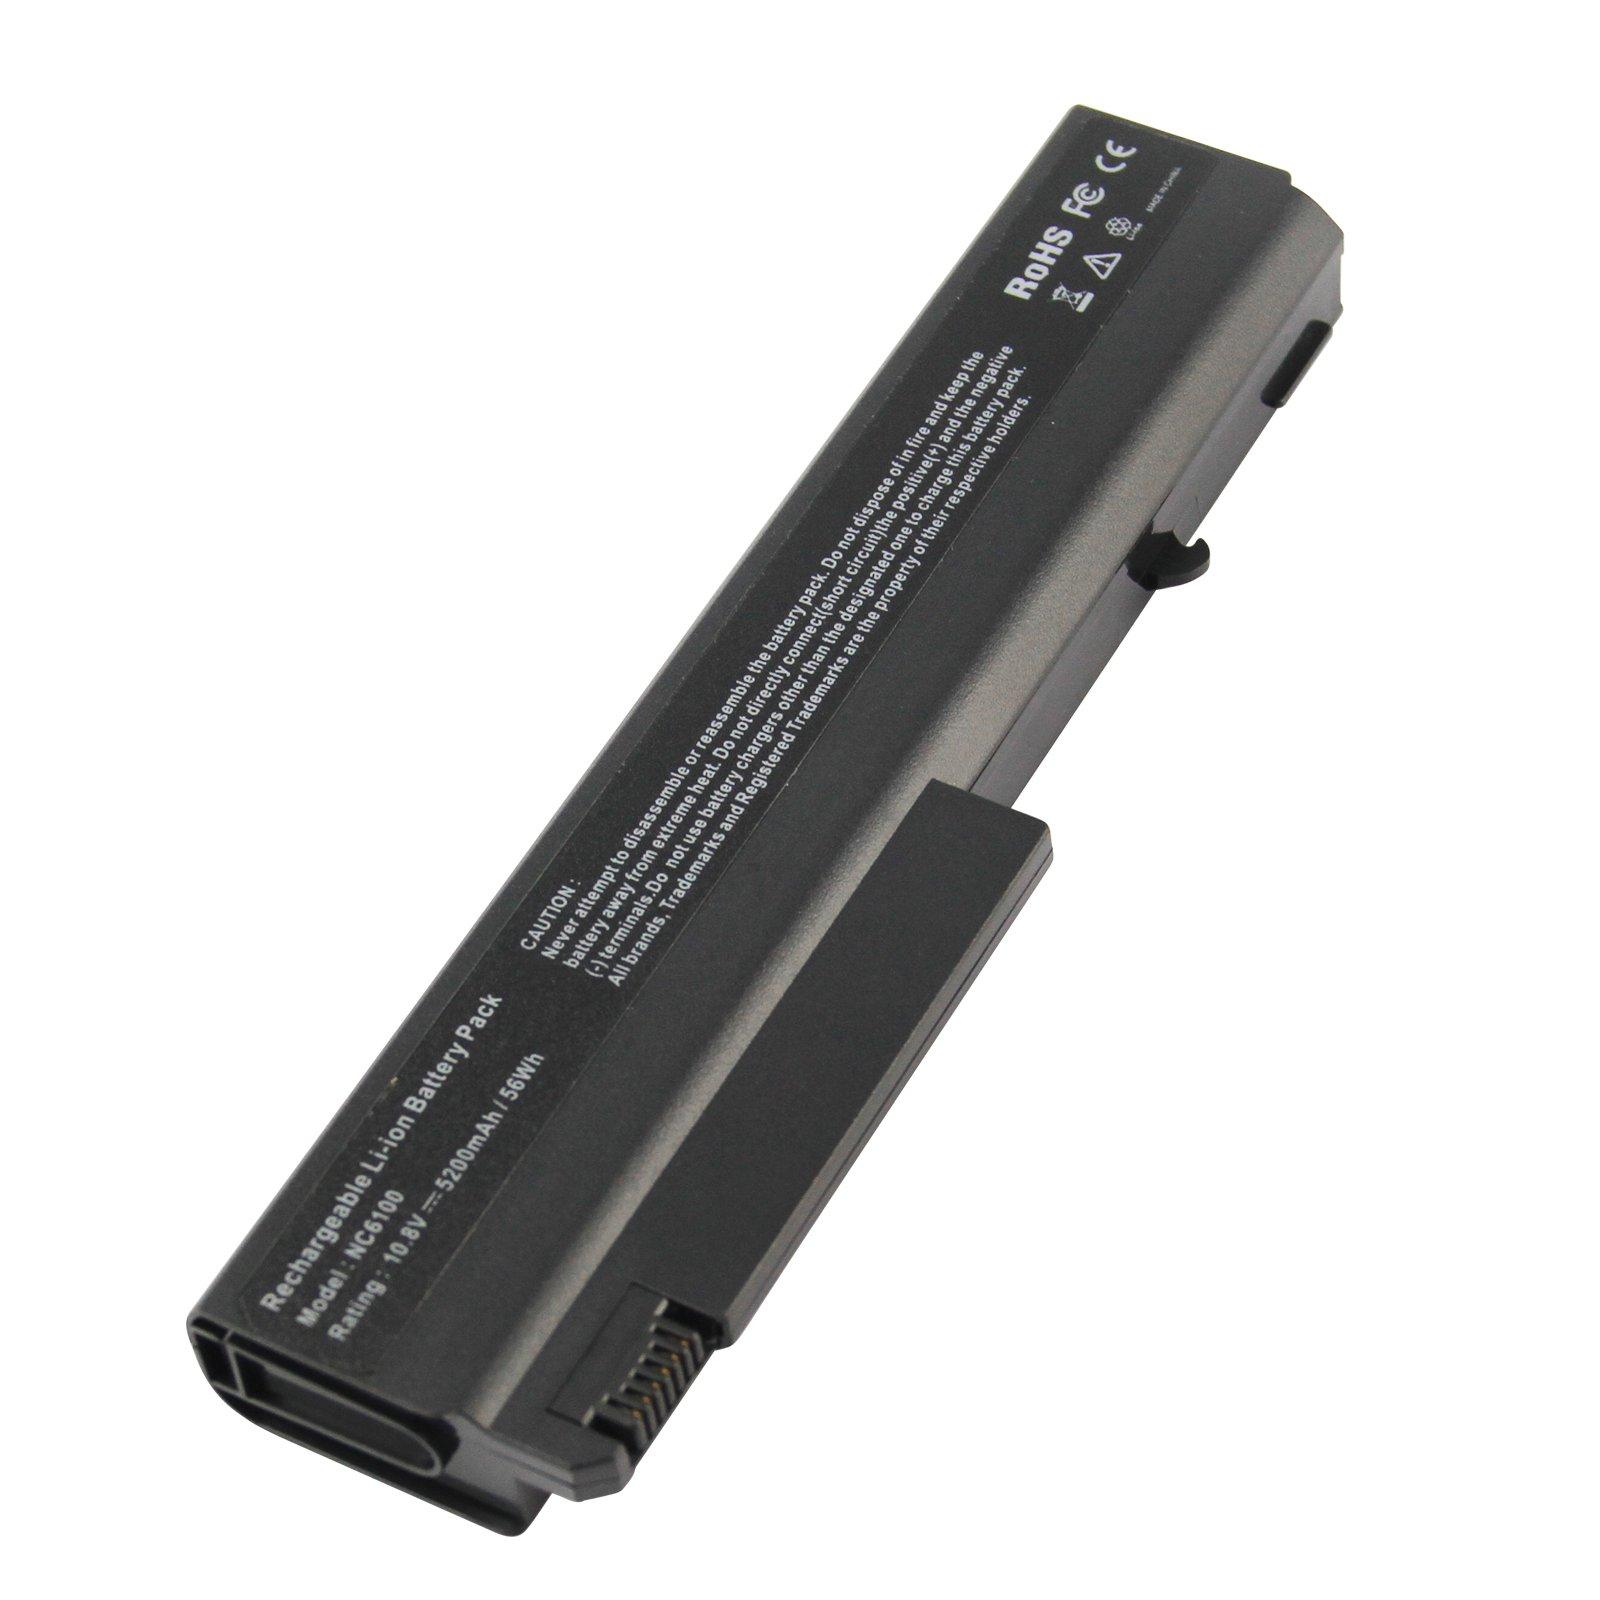 Bateria 5200mah Para Hp Compaq 6510b 6515b 6710b 6910p Nc6100 Nc8420 Nx6100 6710s 6715b 6910